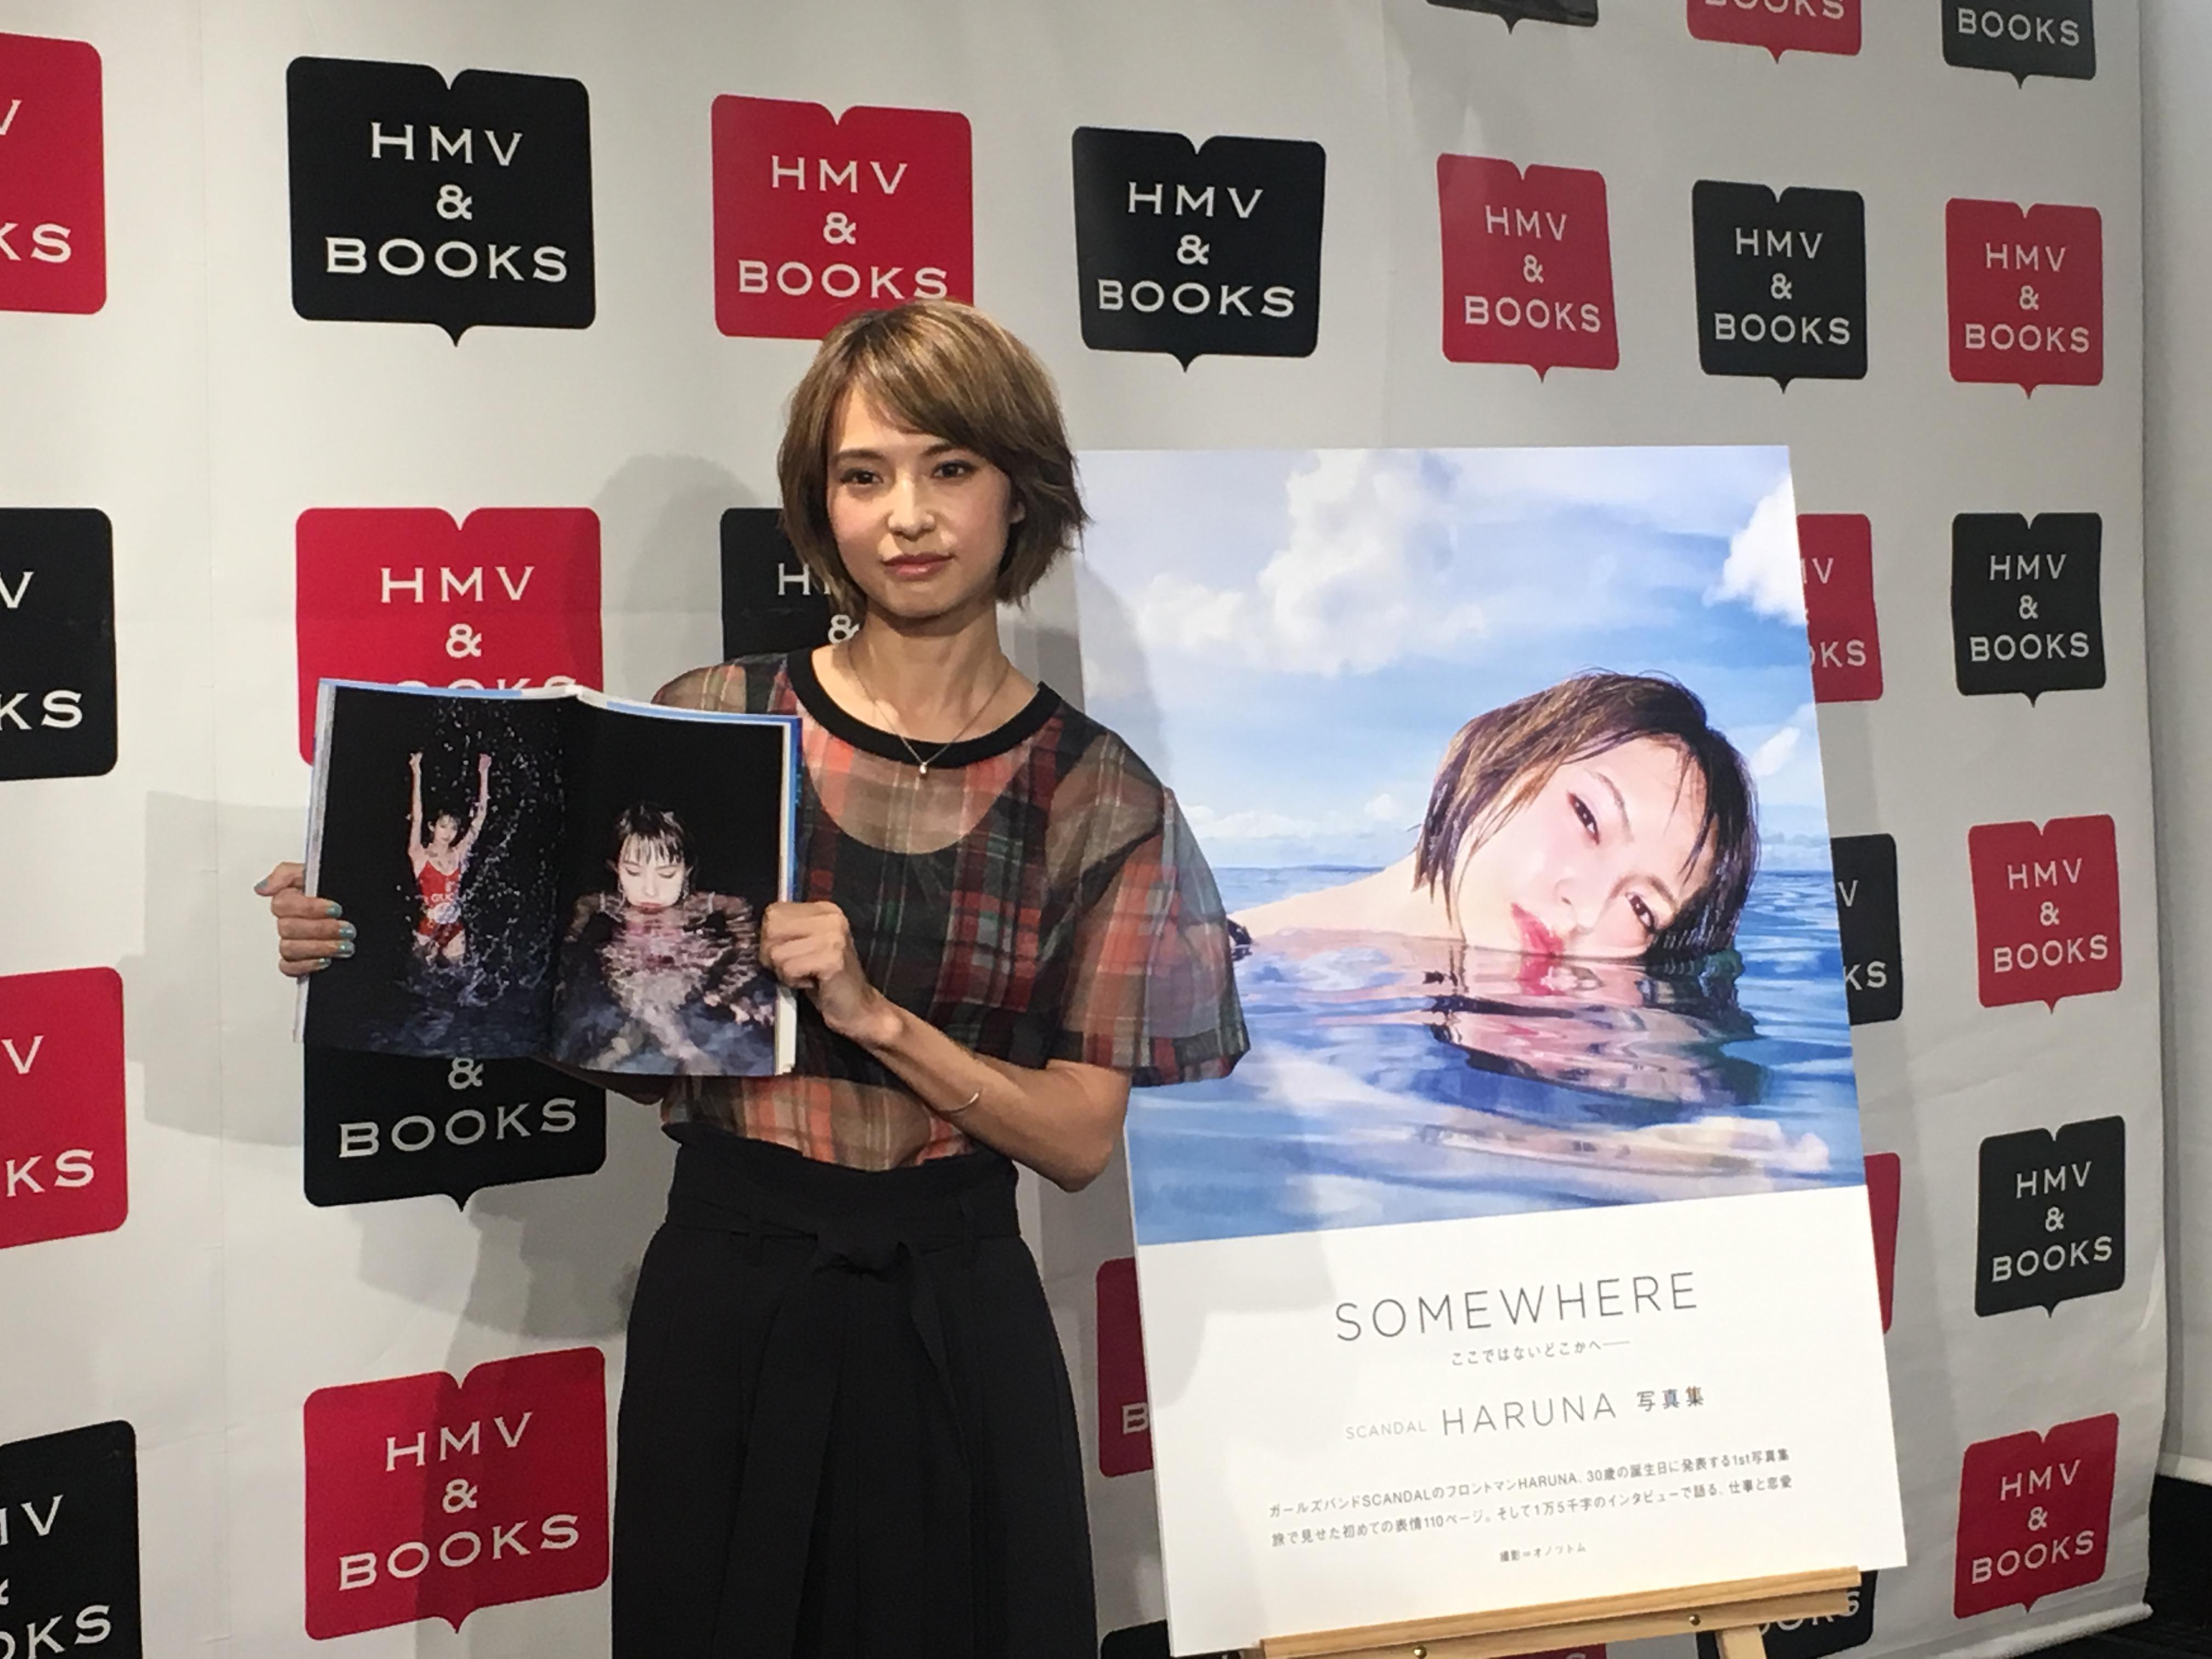 SCANDAL HARUNA首本寫真集「SOMEWHERE」發售紀念活動即將舉辦 SCANDAL_、